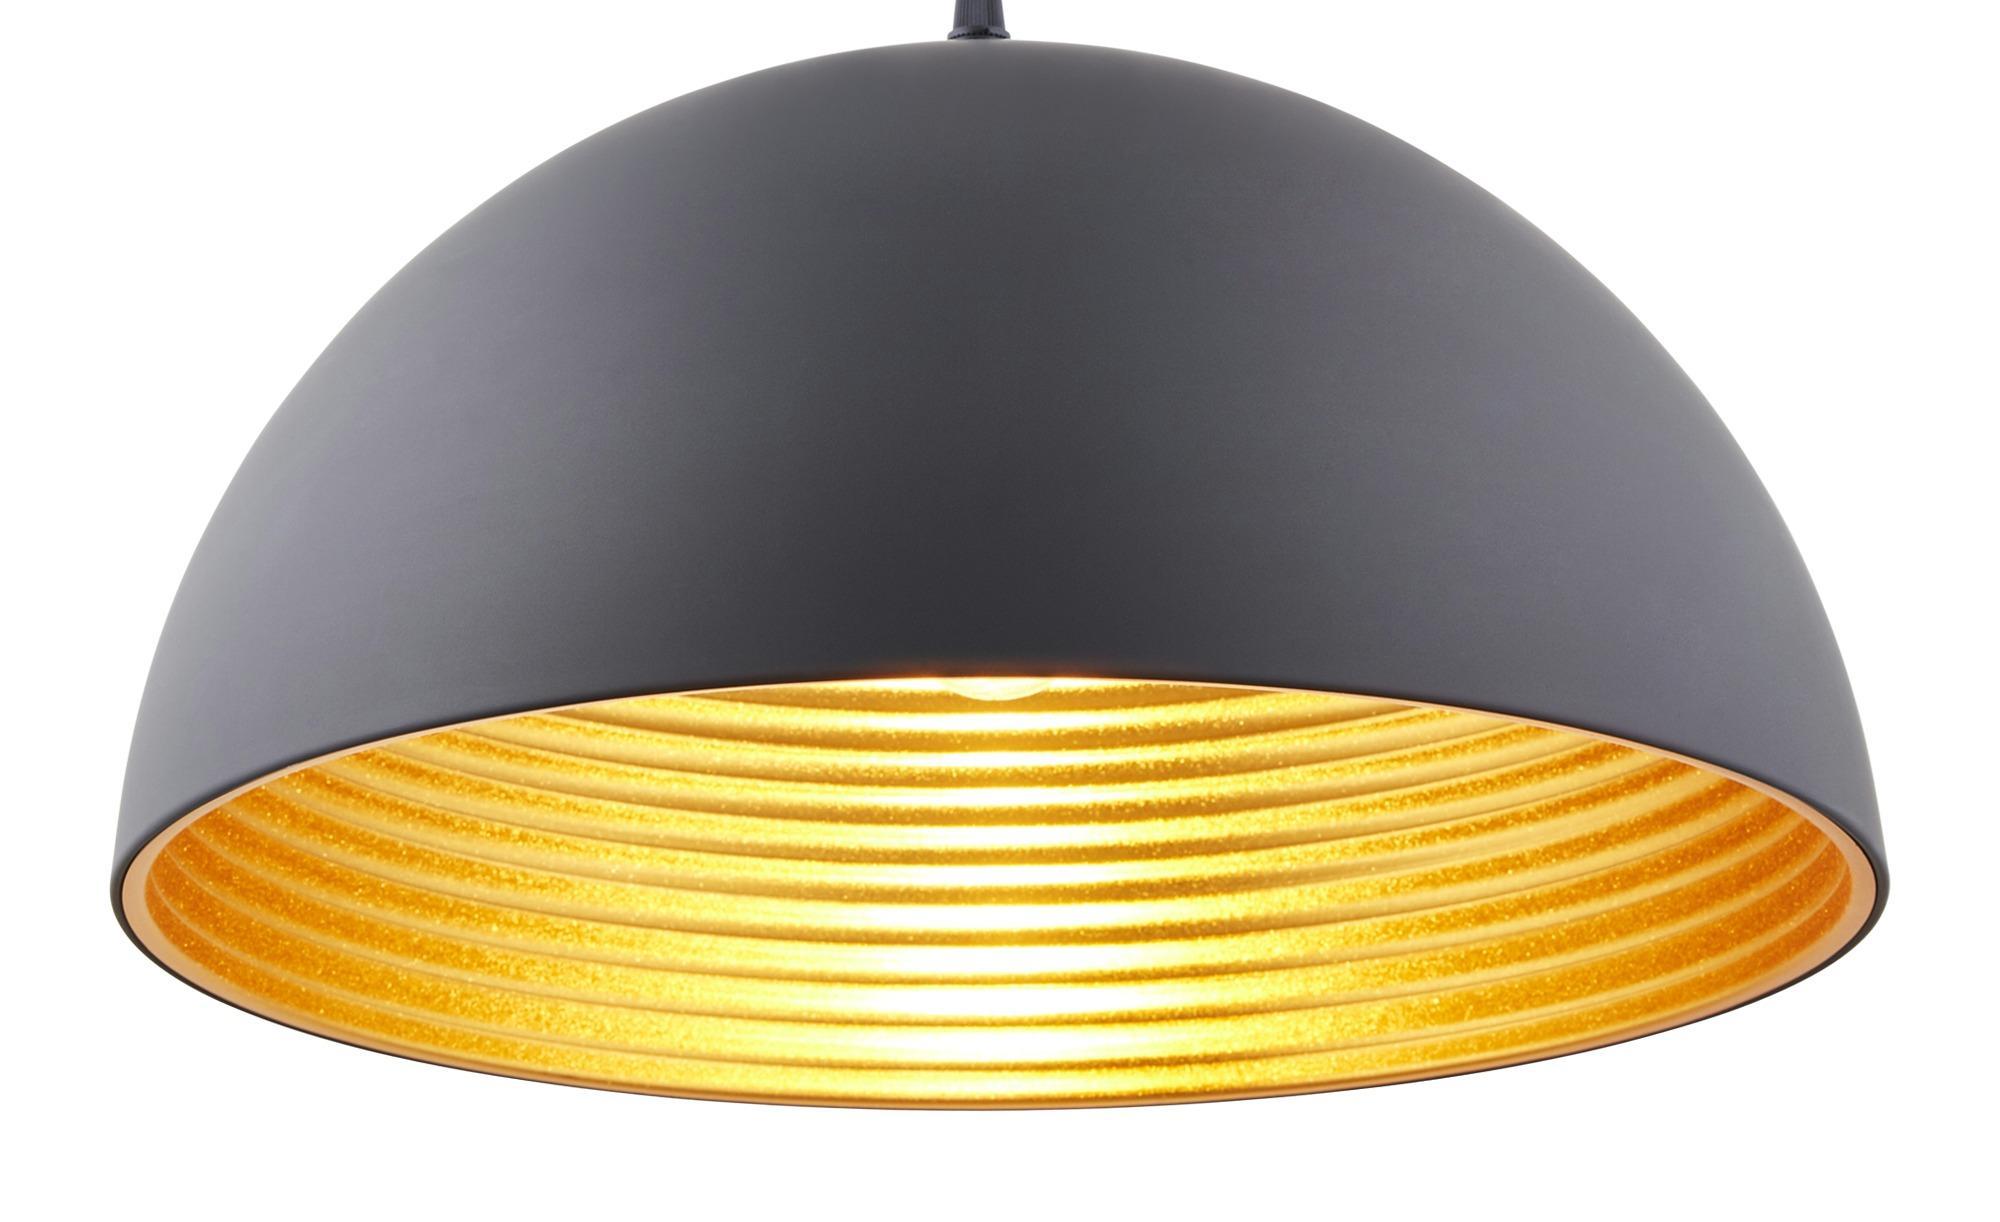 Lampenschirm Schwarz Gold 40 Cm